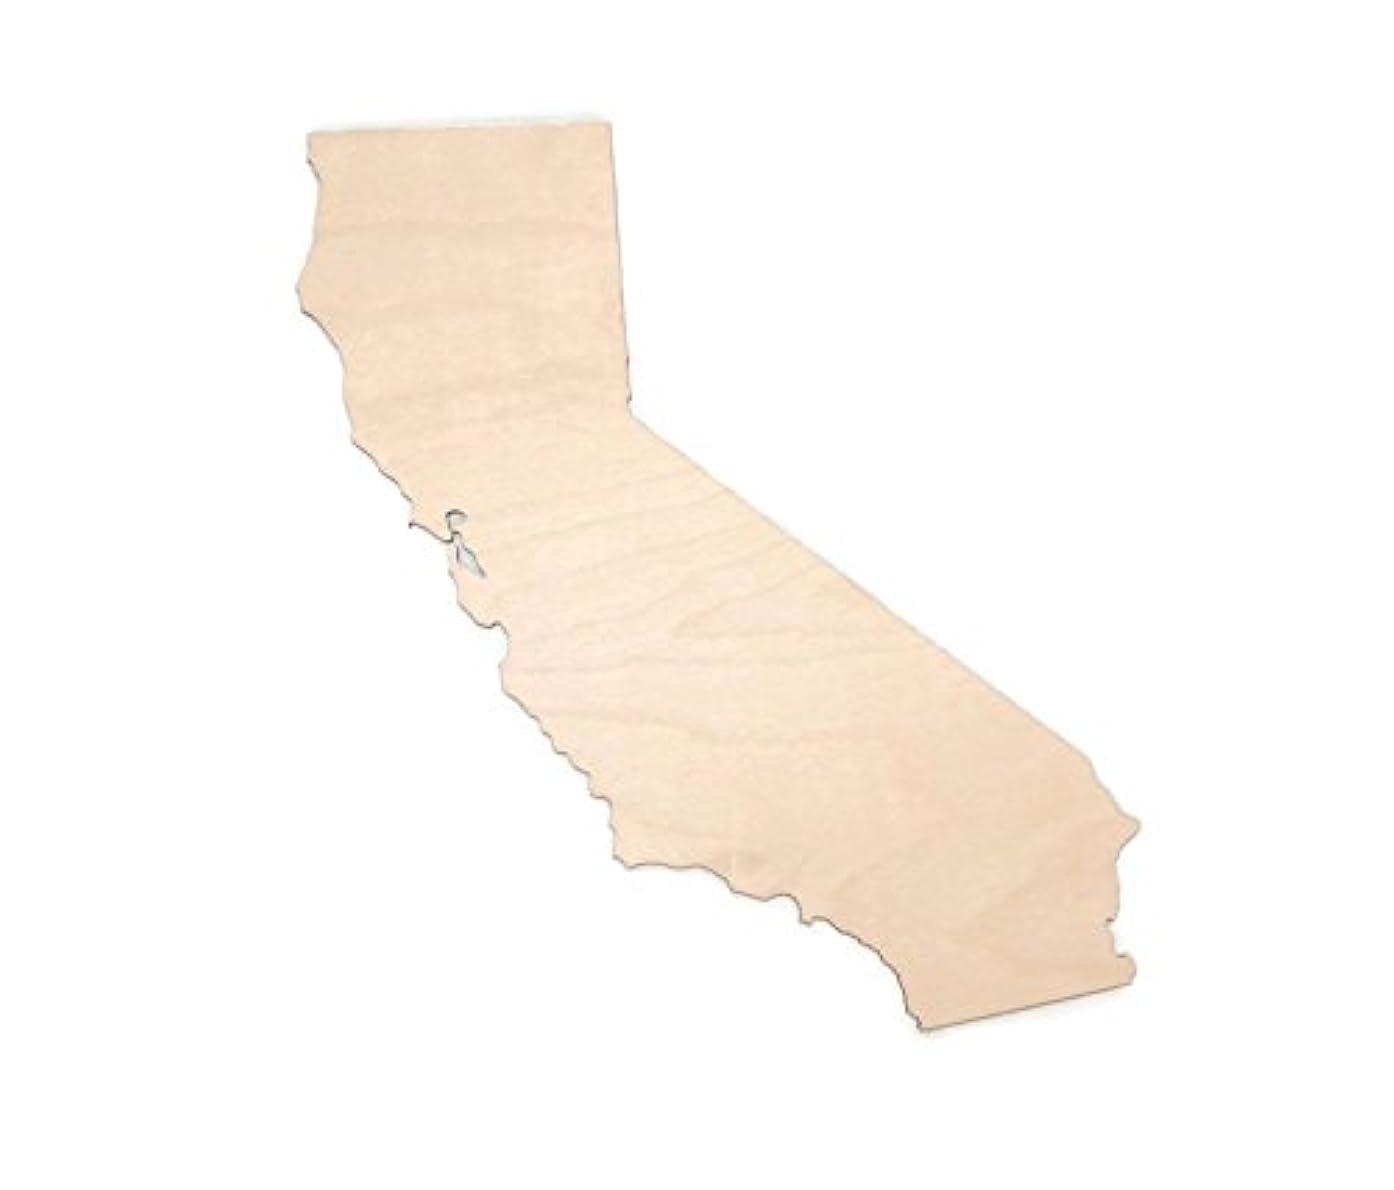 Gocutouts California State 12